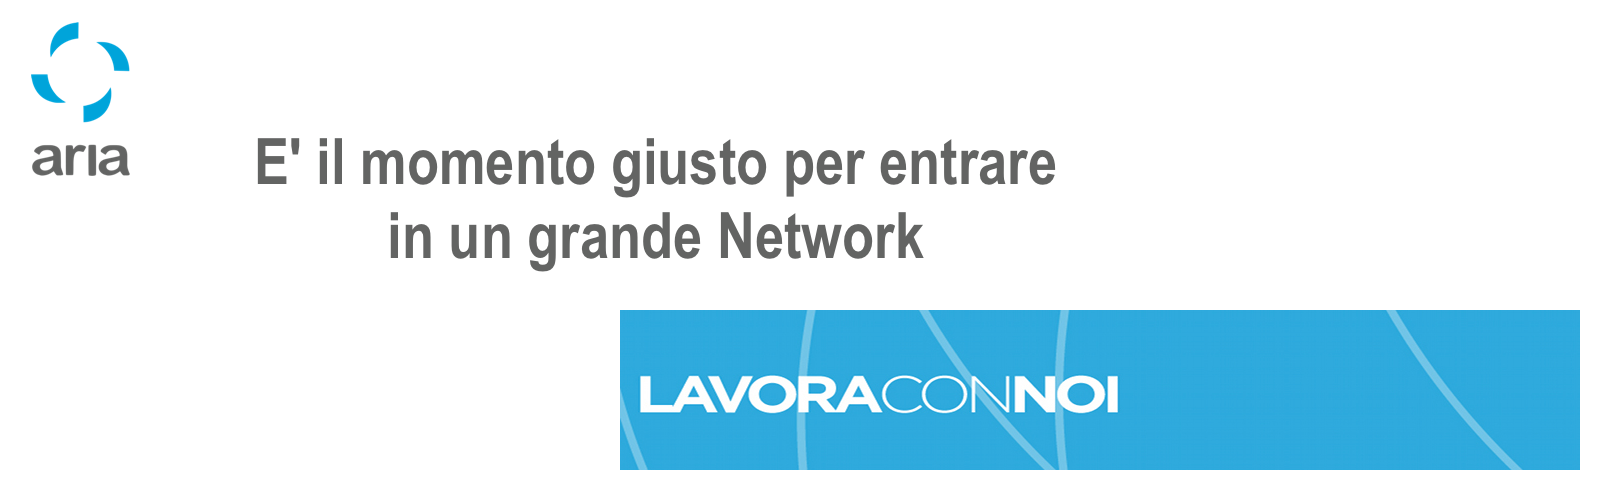 Entra in un grande Network! lavora con noi